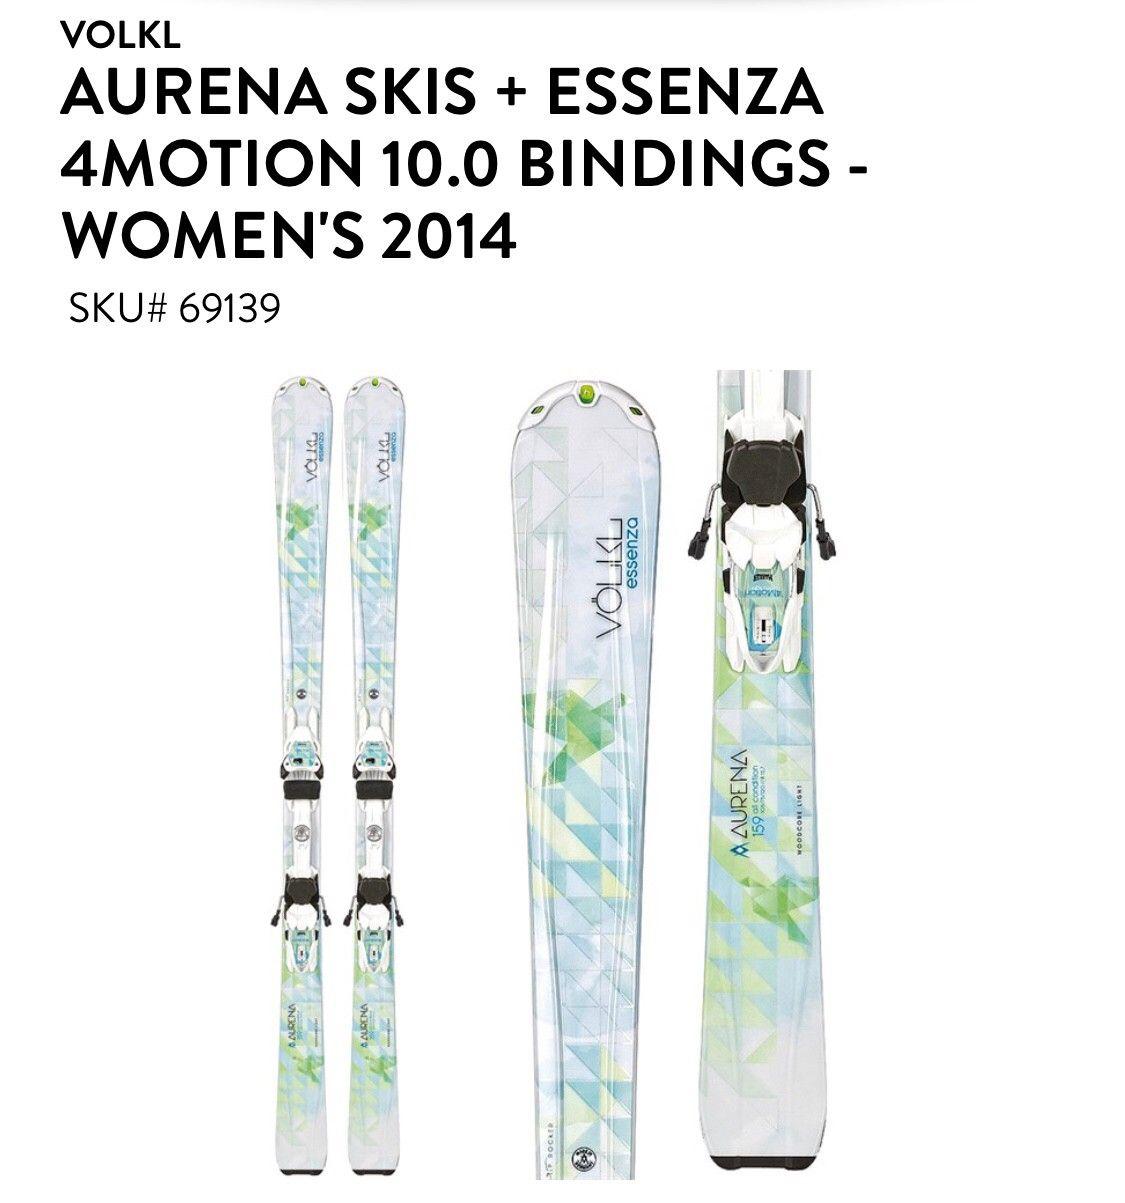 VOLKL AURENA SKIS 159 ESSENZA 4MOTION 10.0 BINDINGS - WOMEN'S 2014 - Bergen  - Fantastiske VOLKL slalåm ski, pent brukt, smøret og klar for bruk.  AURENA SKIS 159 cm Essenza 4MOTION 10.0 BINDINGS  WOMEN'S 2014 Inkludert staver (120 cm) og veske - Bergen